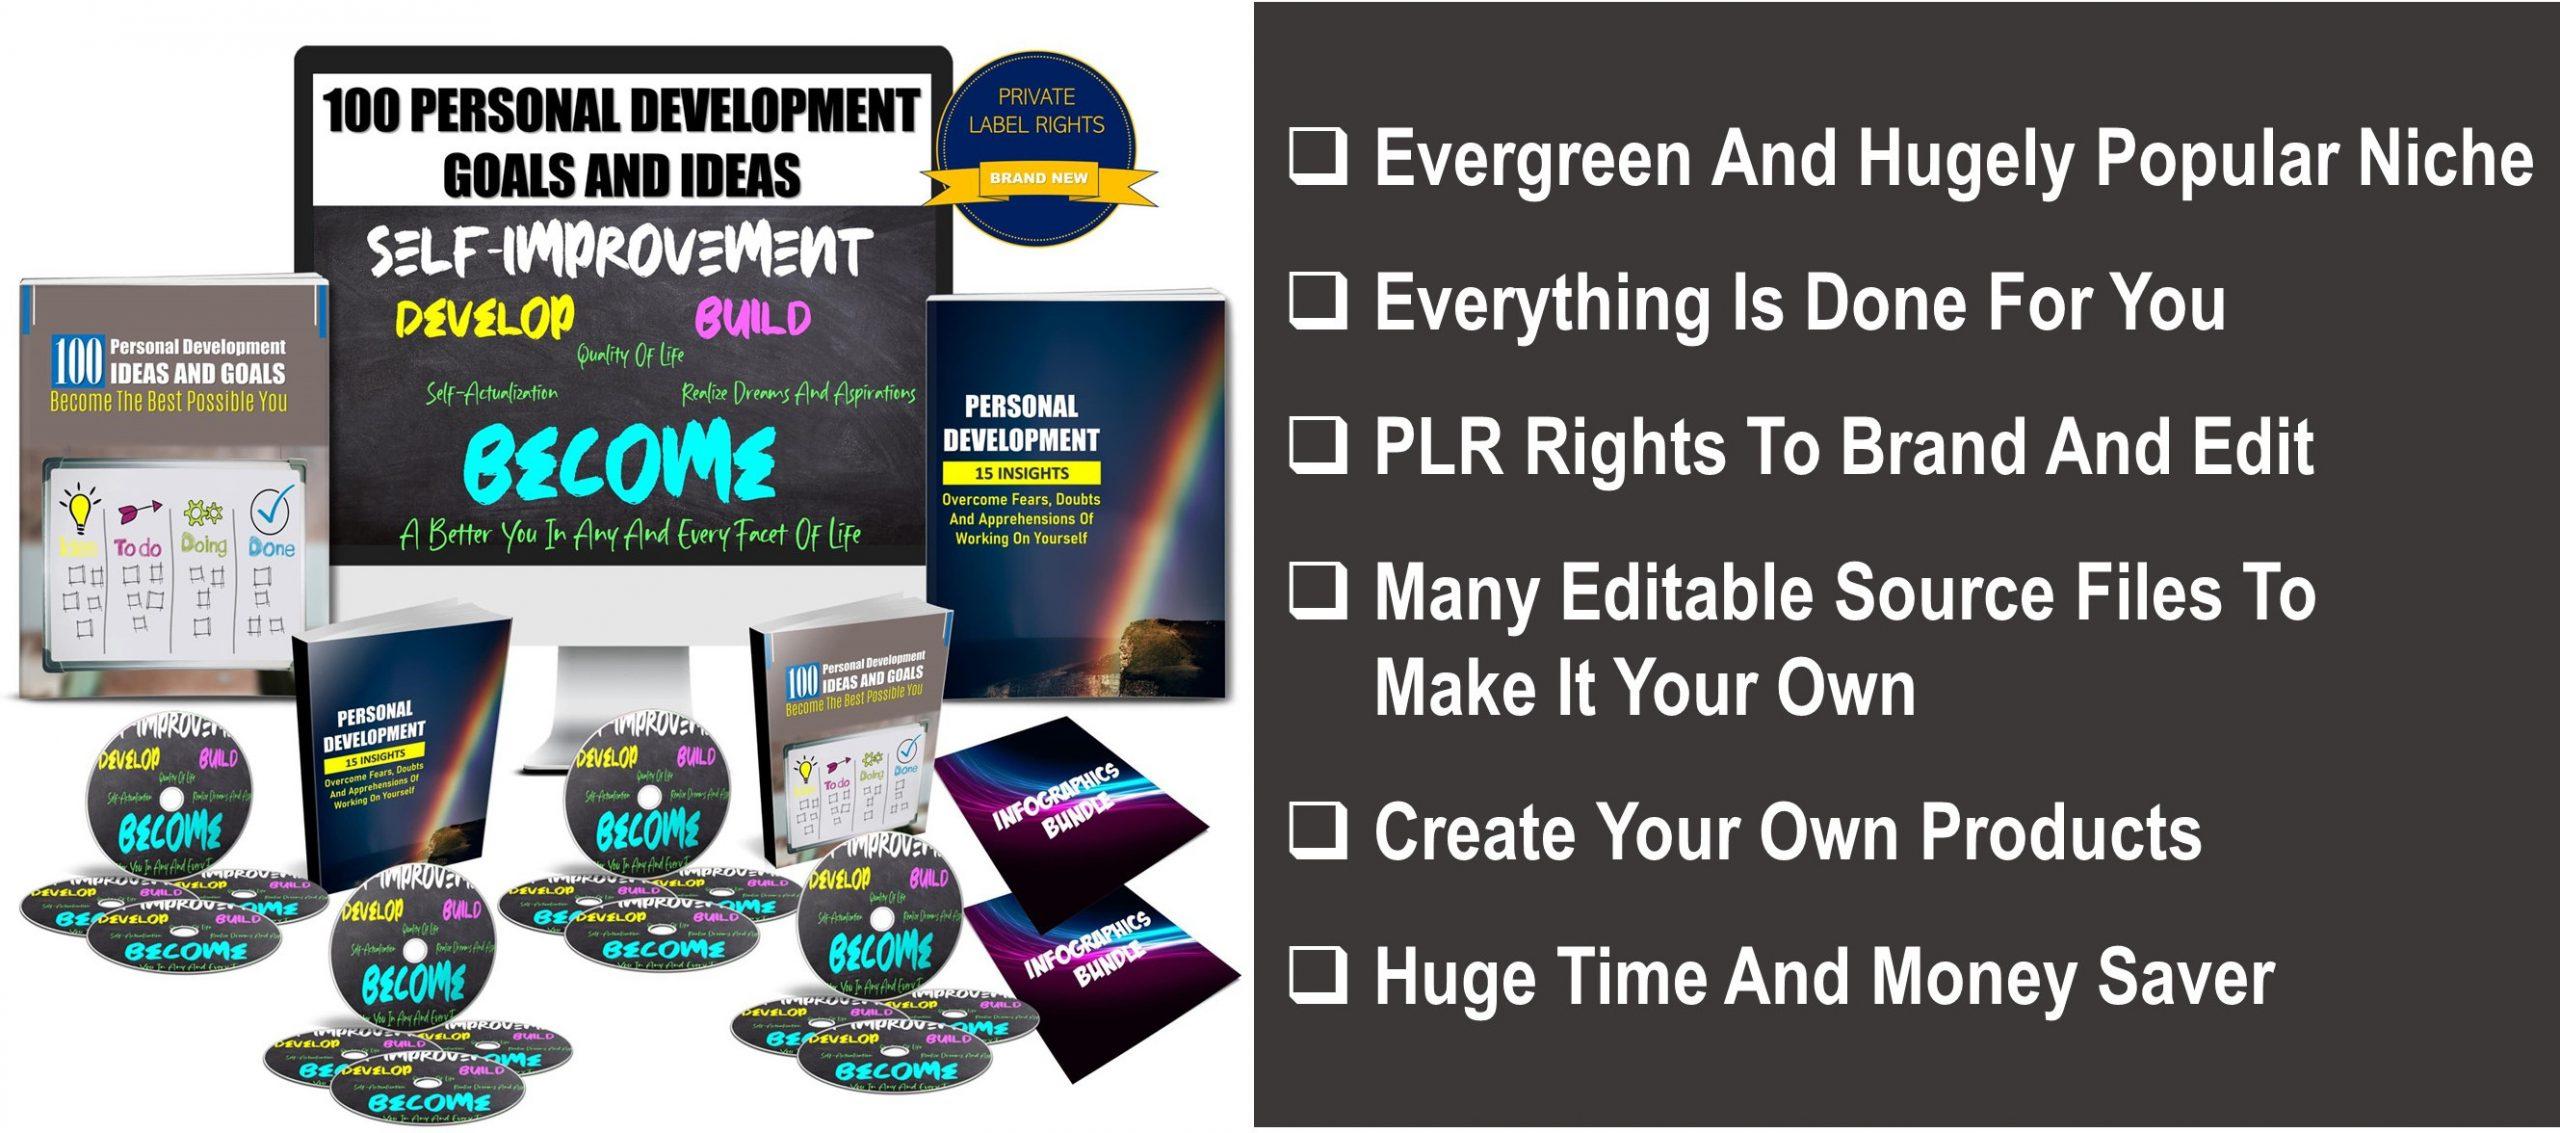 100 Personal Development Goals And Ideas PLR